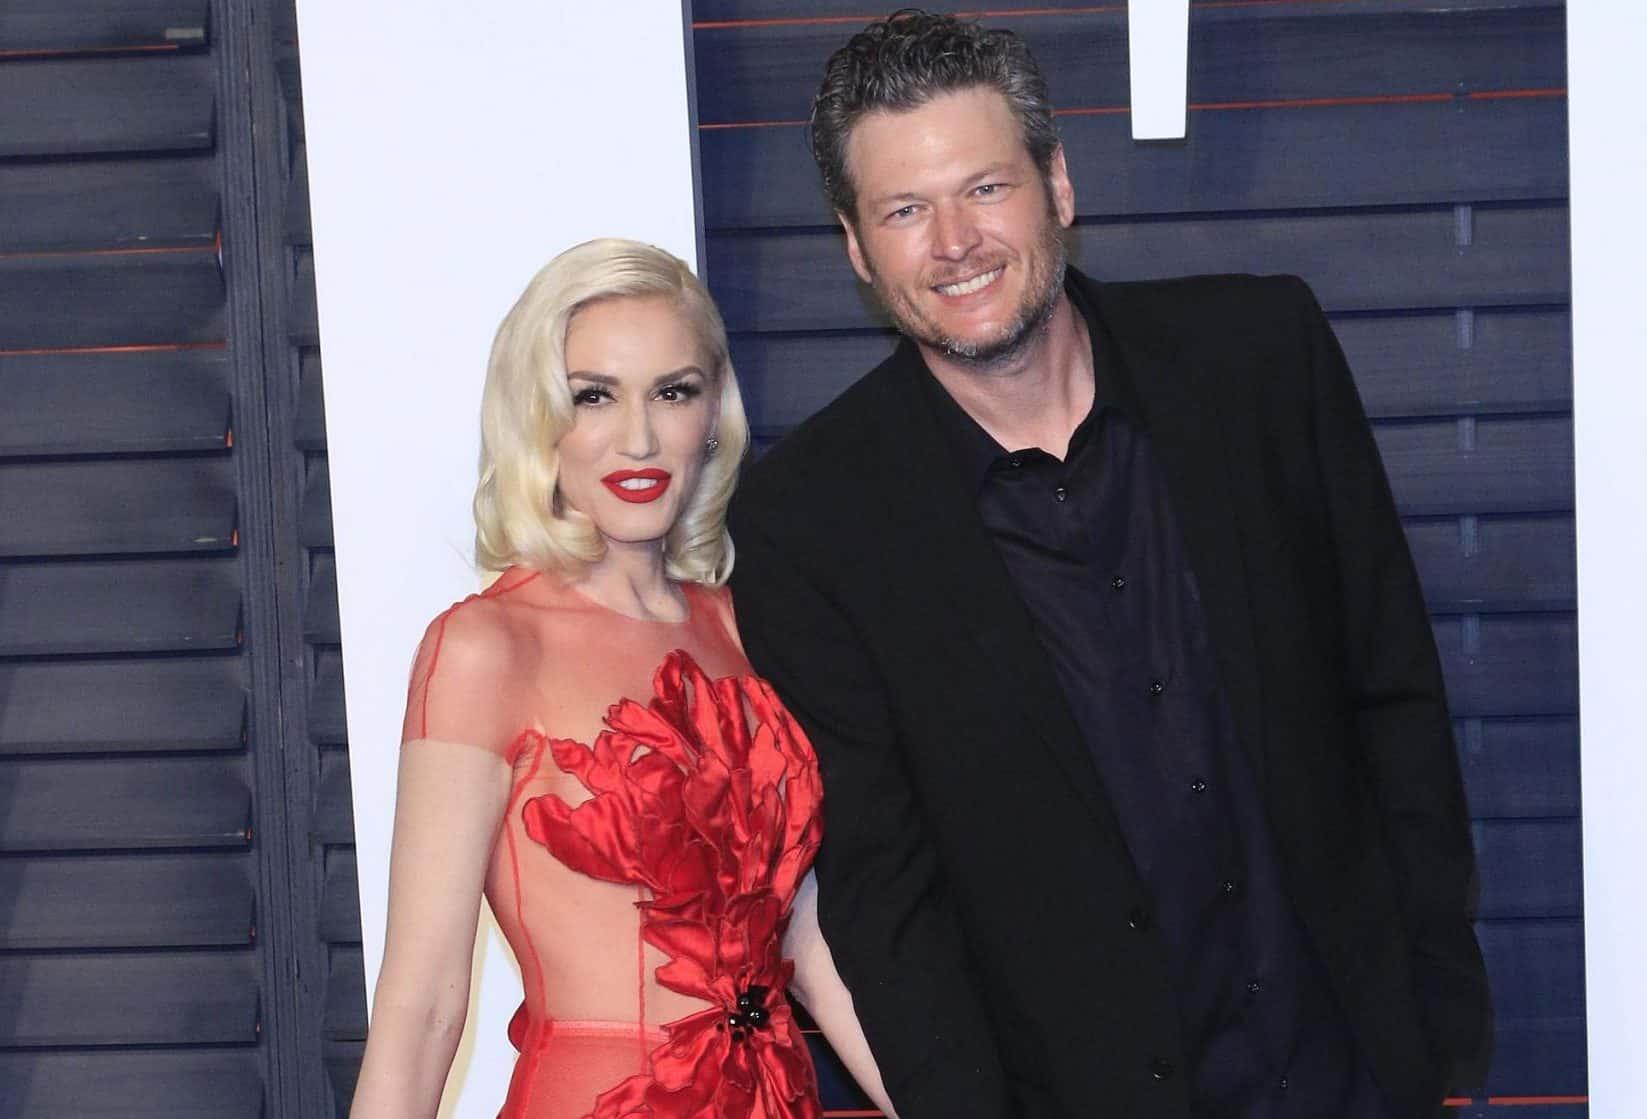 Gwen Stefani and Blake Shelton (Photo: Joe Seer/Shutterstock.com)